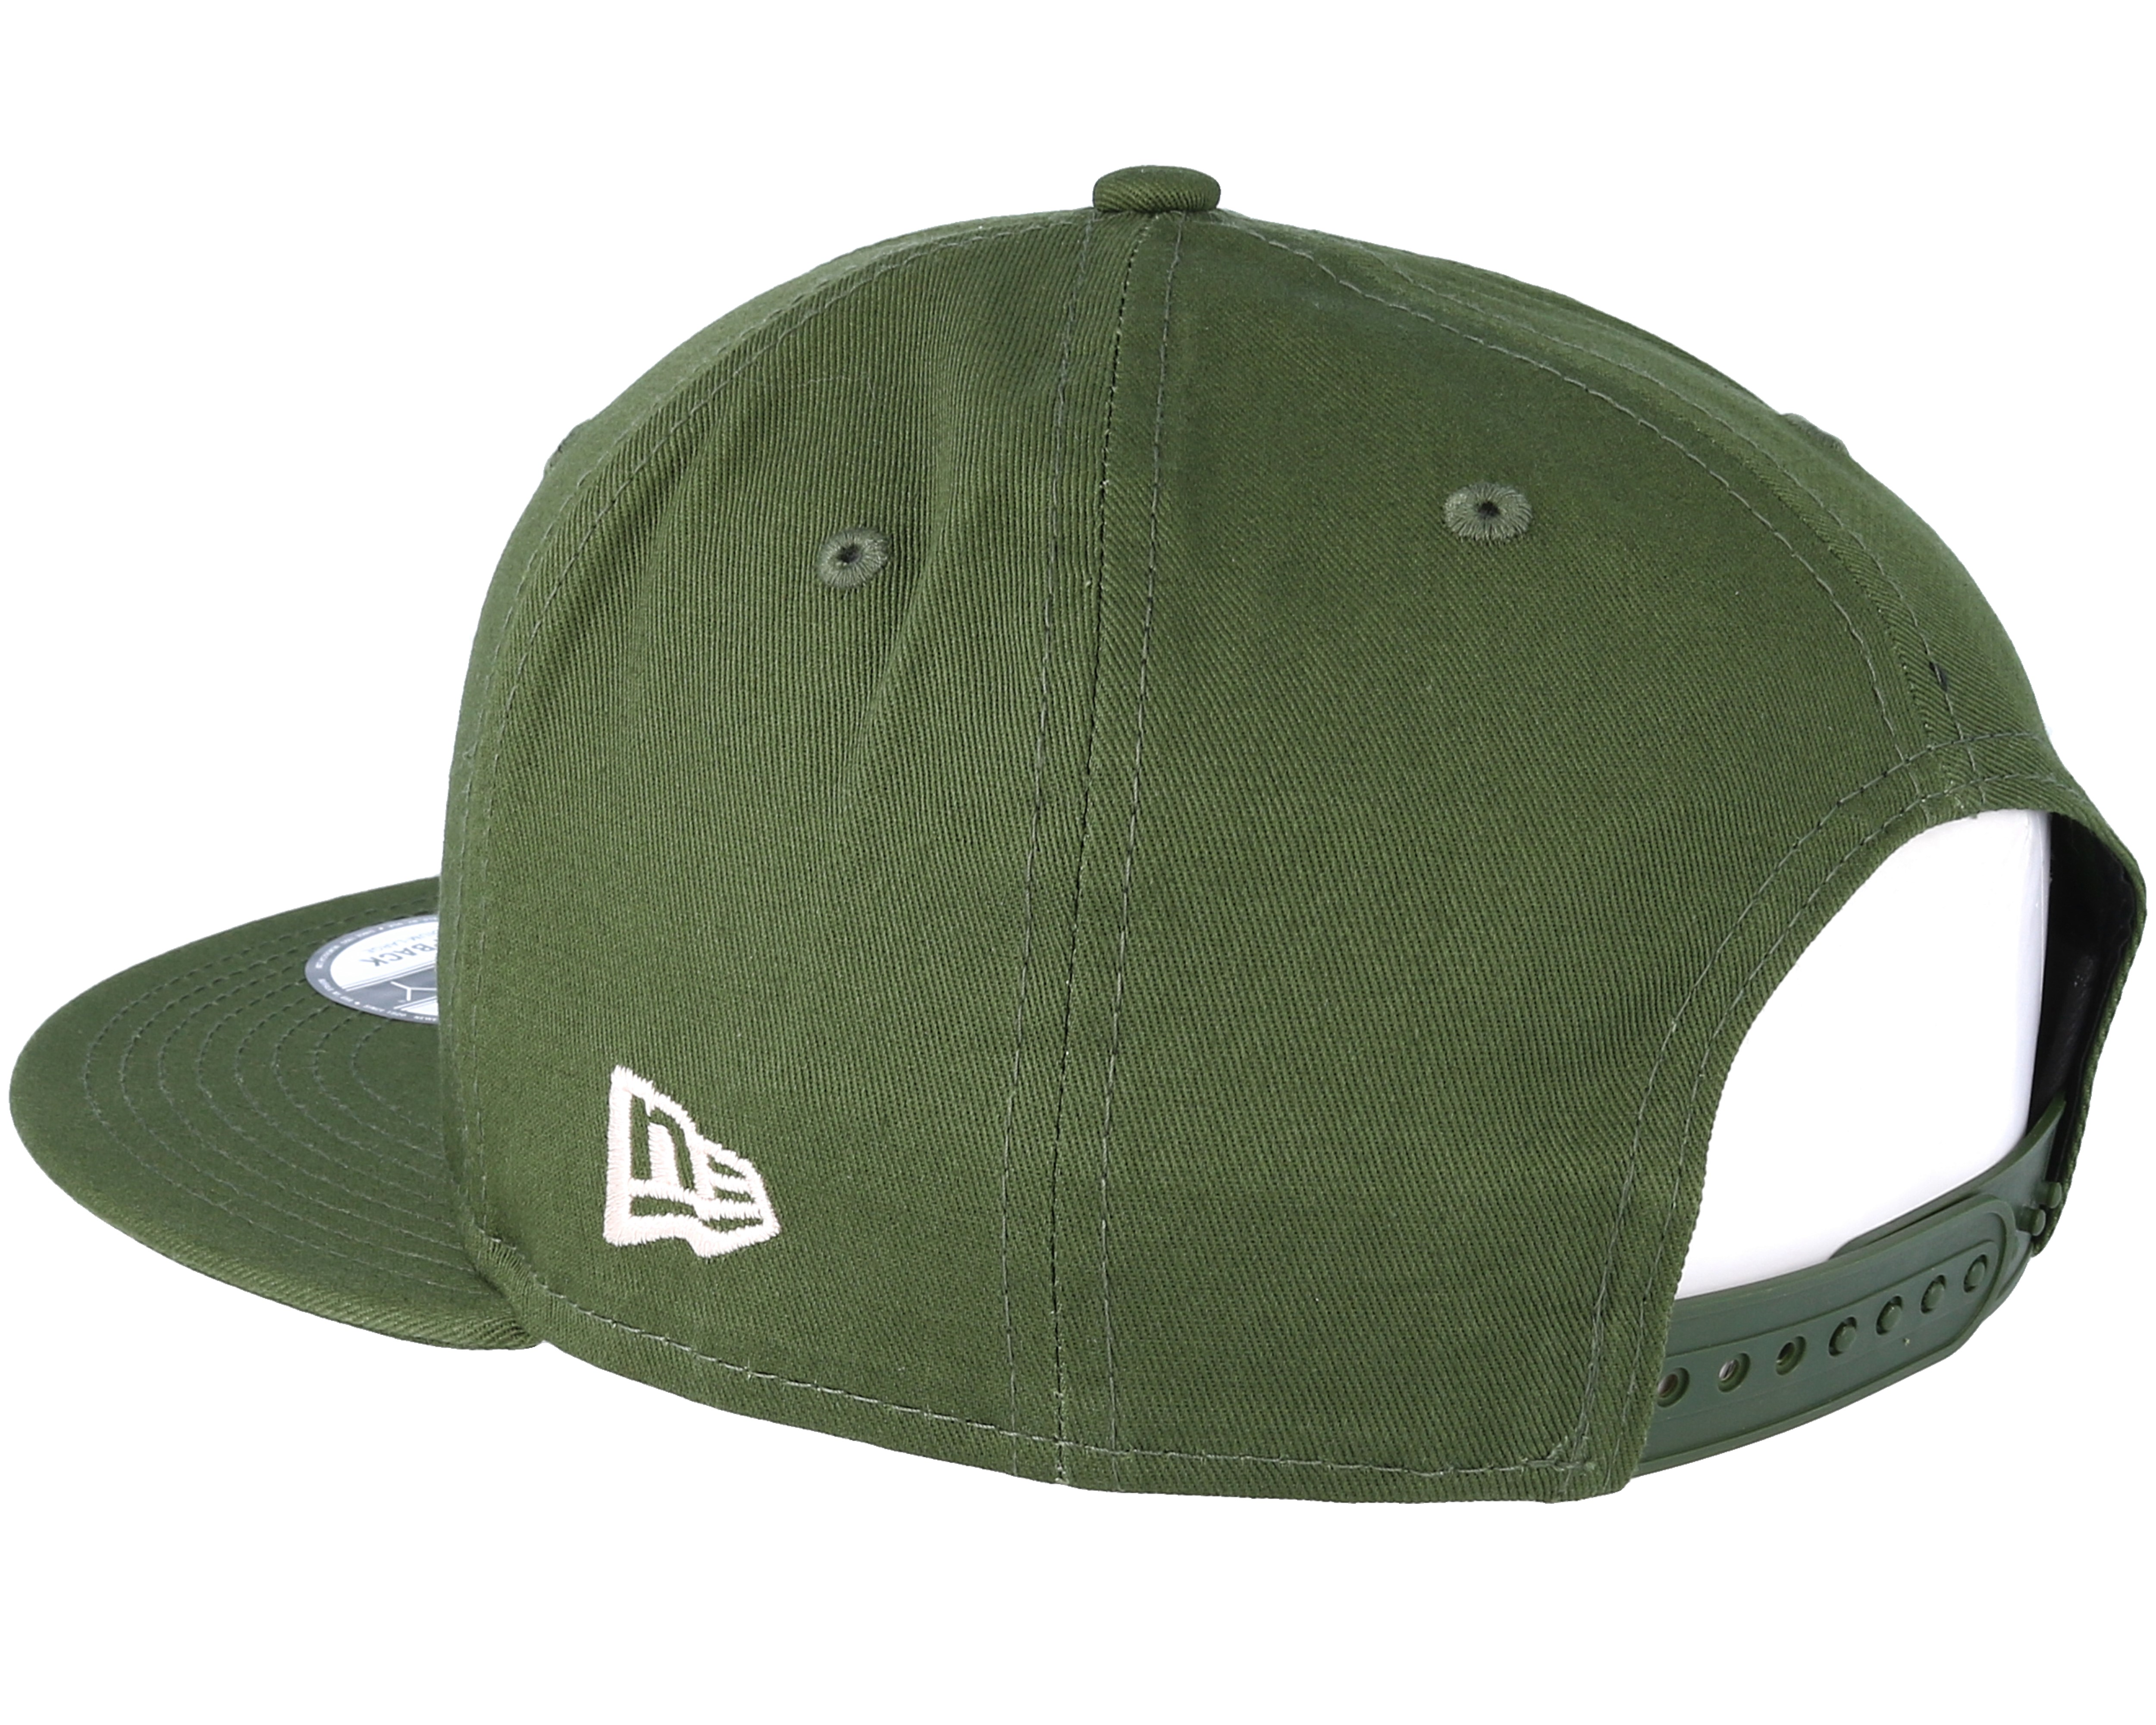 new york yankees league essential 9fifty green snapback new era cap. Black Bedroom Furniture Sets. Home Design Ideas